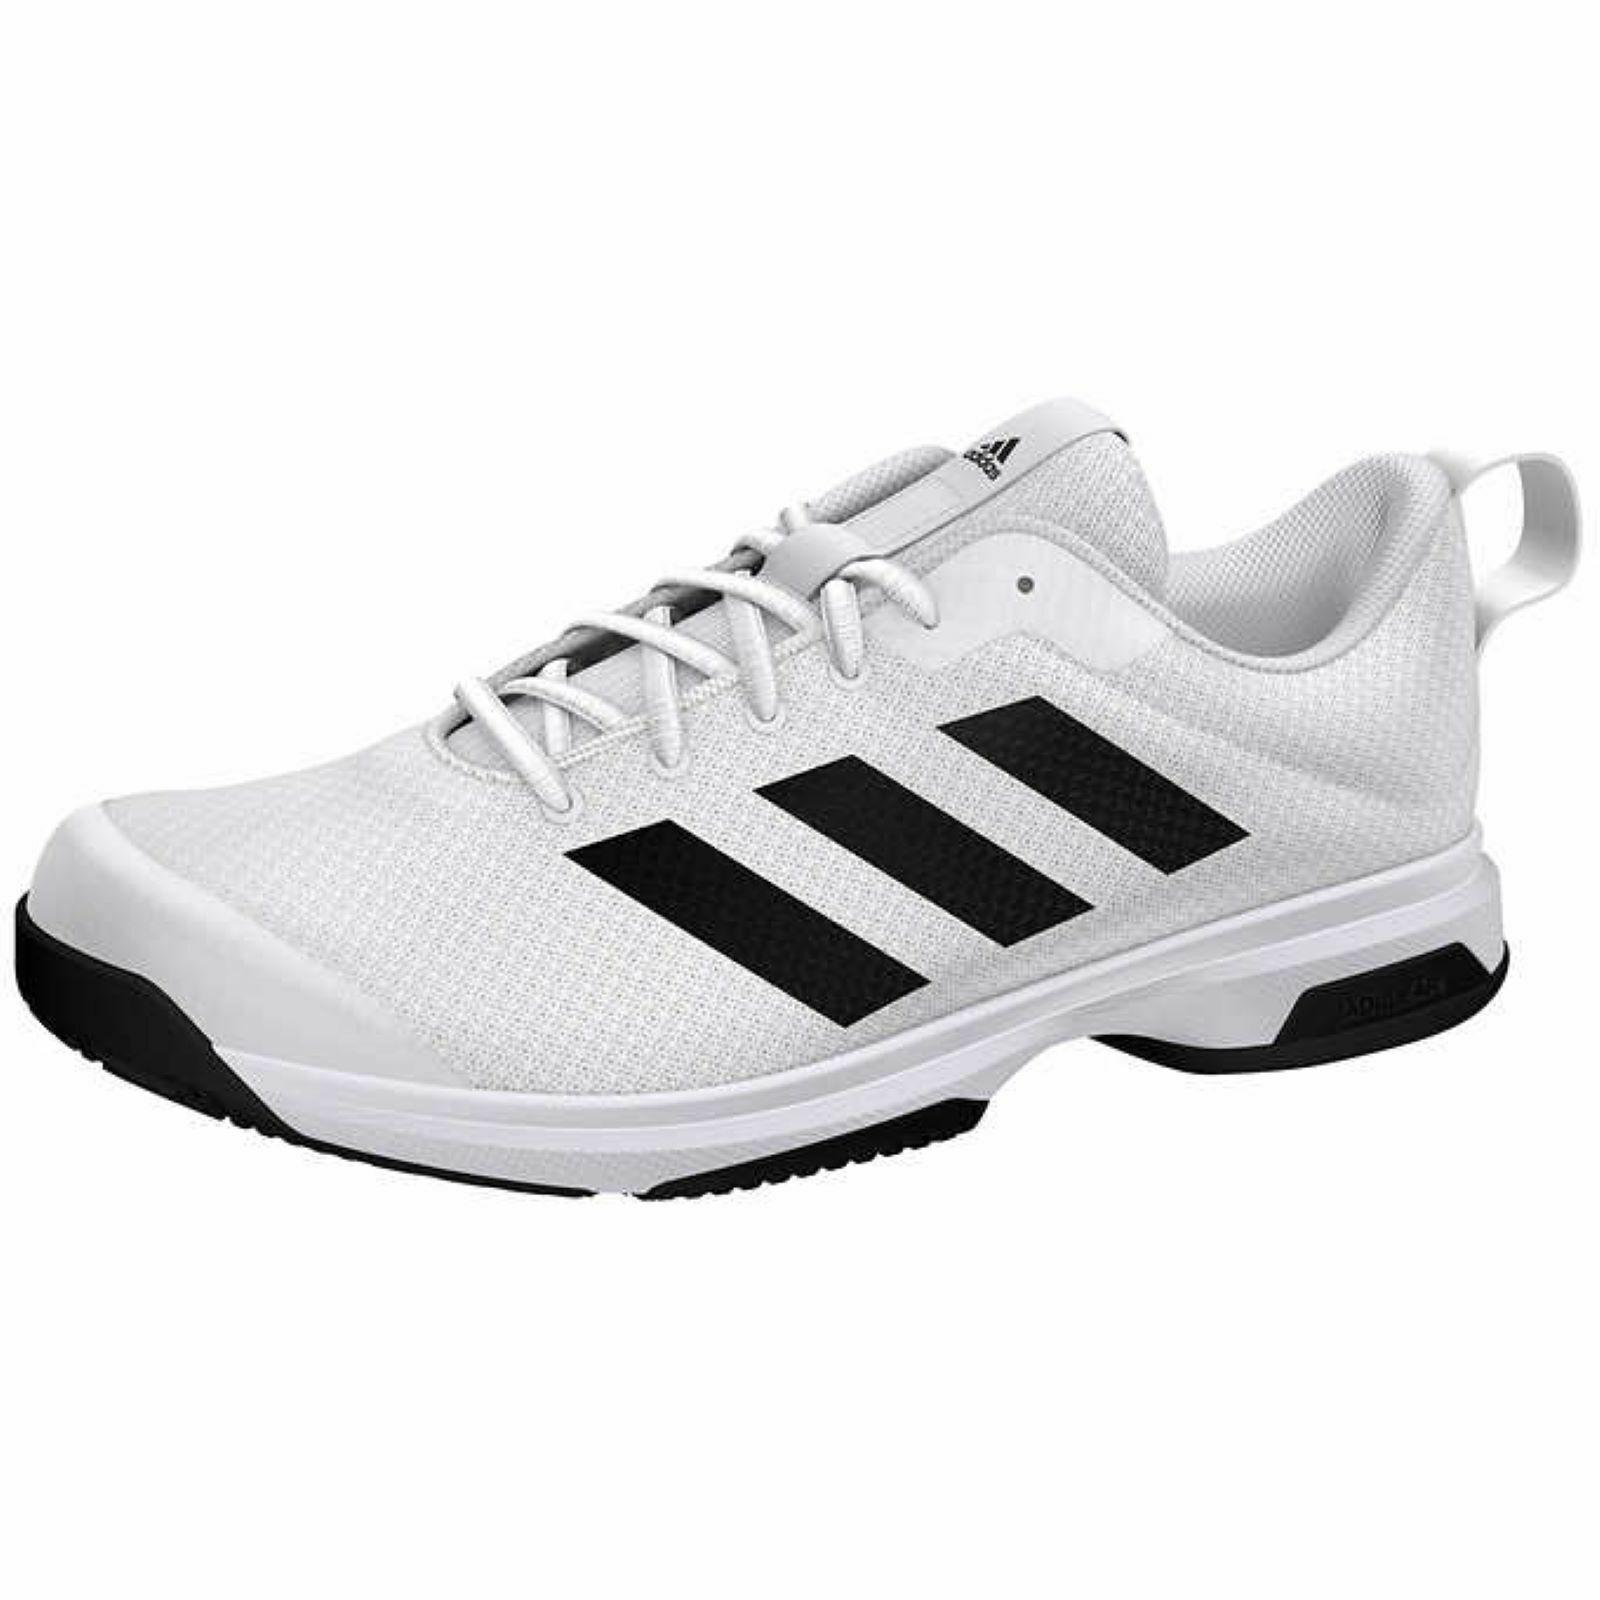 Adidas Mens Running Shoes White Black Men's Athletic Sneaker New